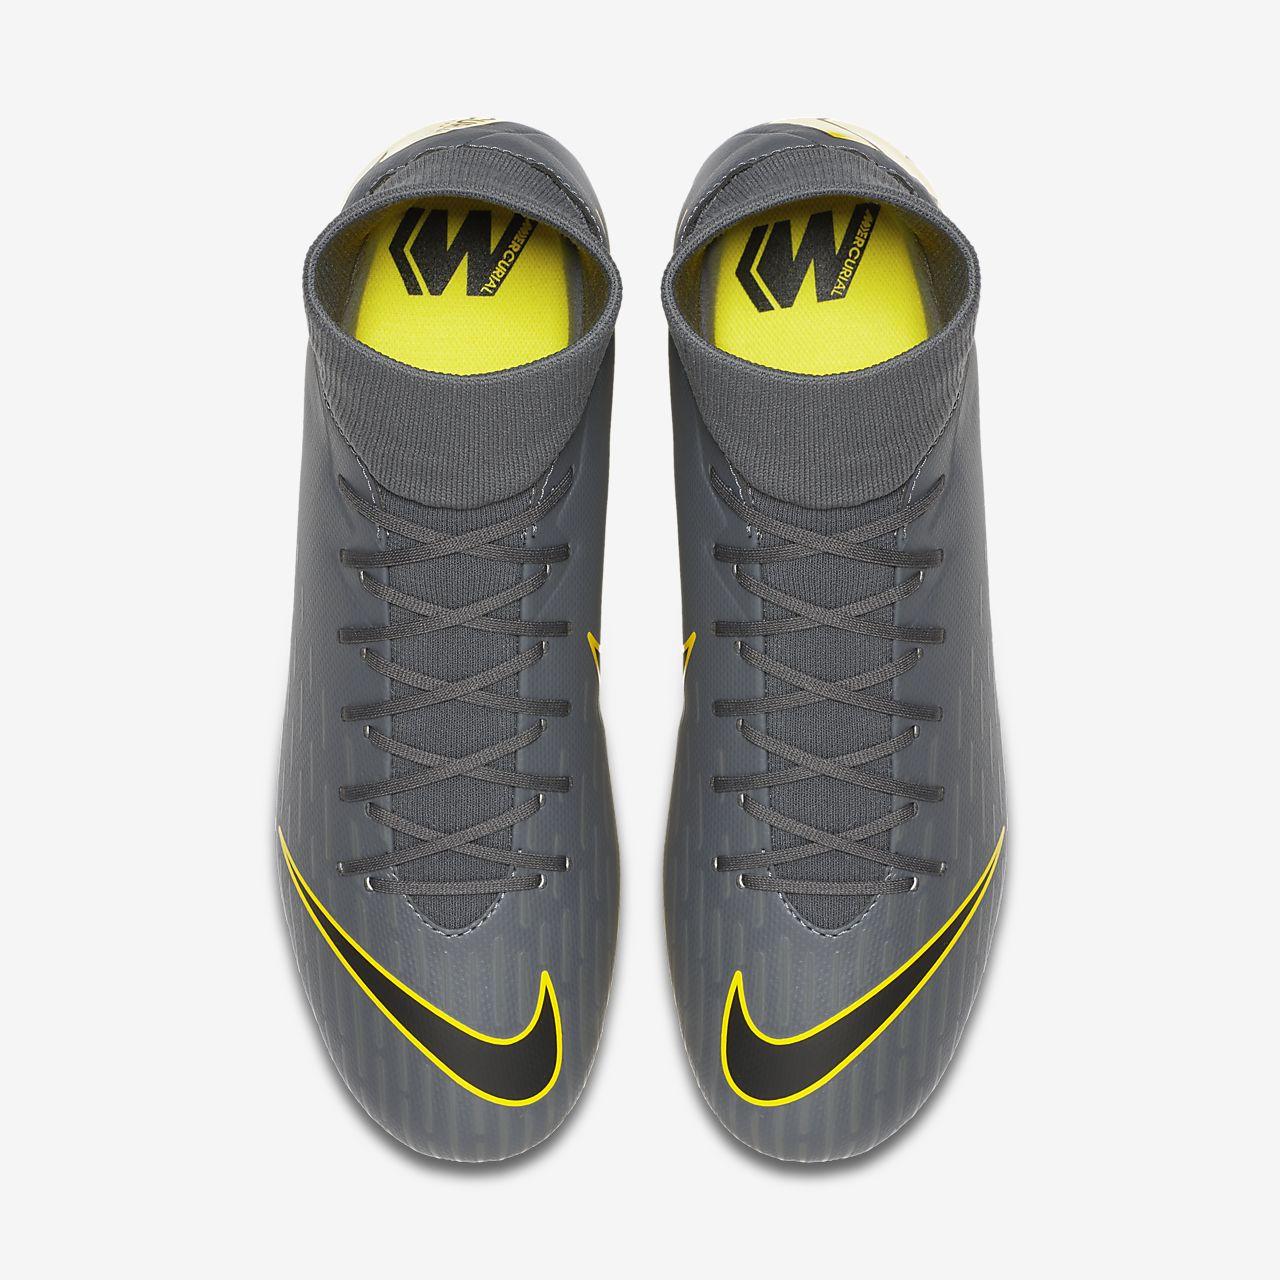 78081c8e990b Nike Mercurial Superfly VI Academy SG-PRO Soft-Ground Football Boot ...